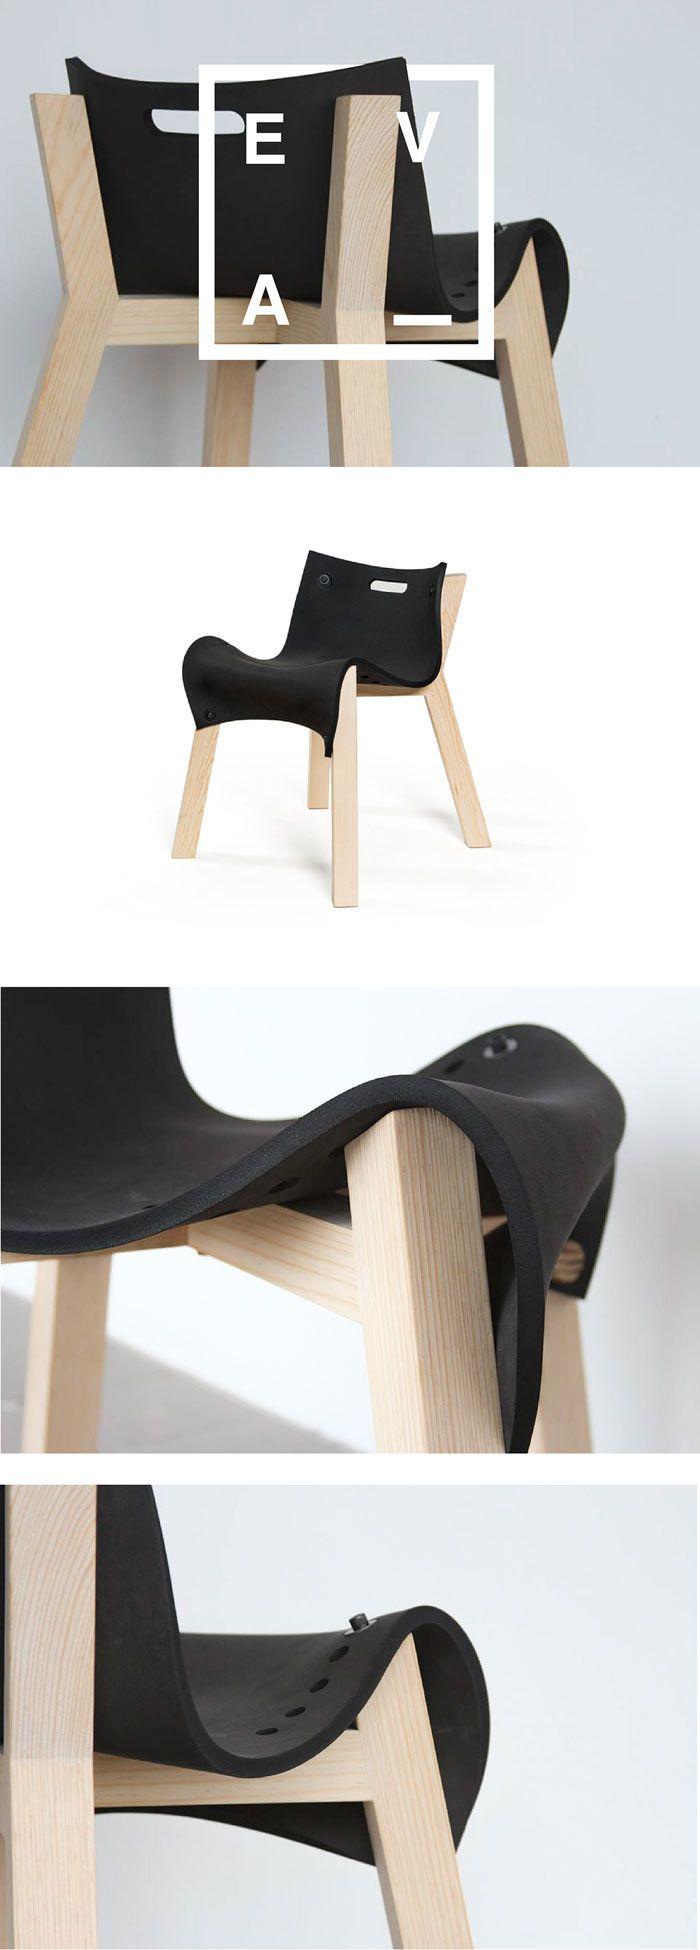 La Eva, Chair Design by David Ortiz